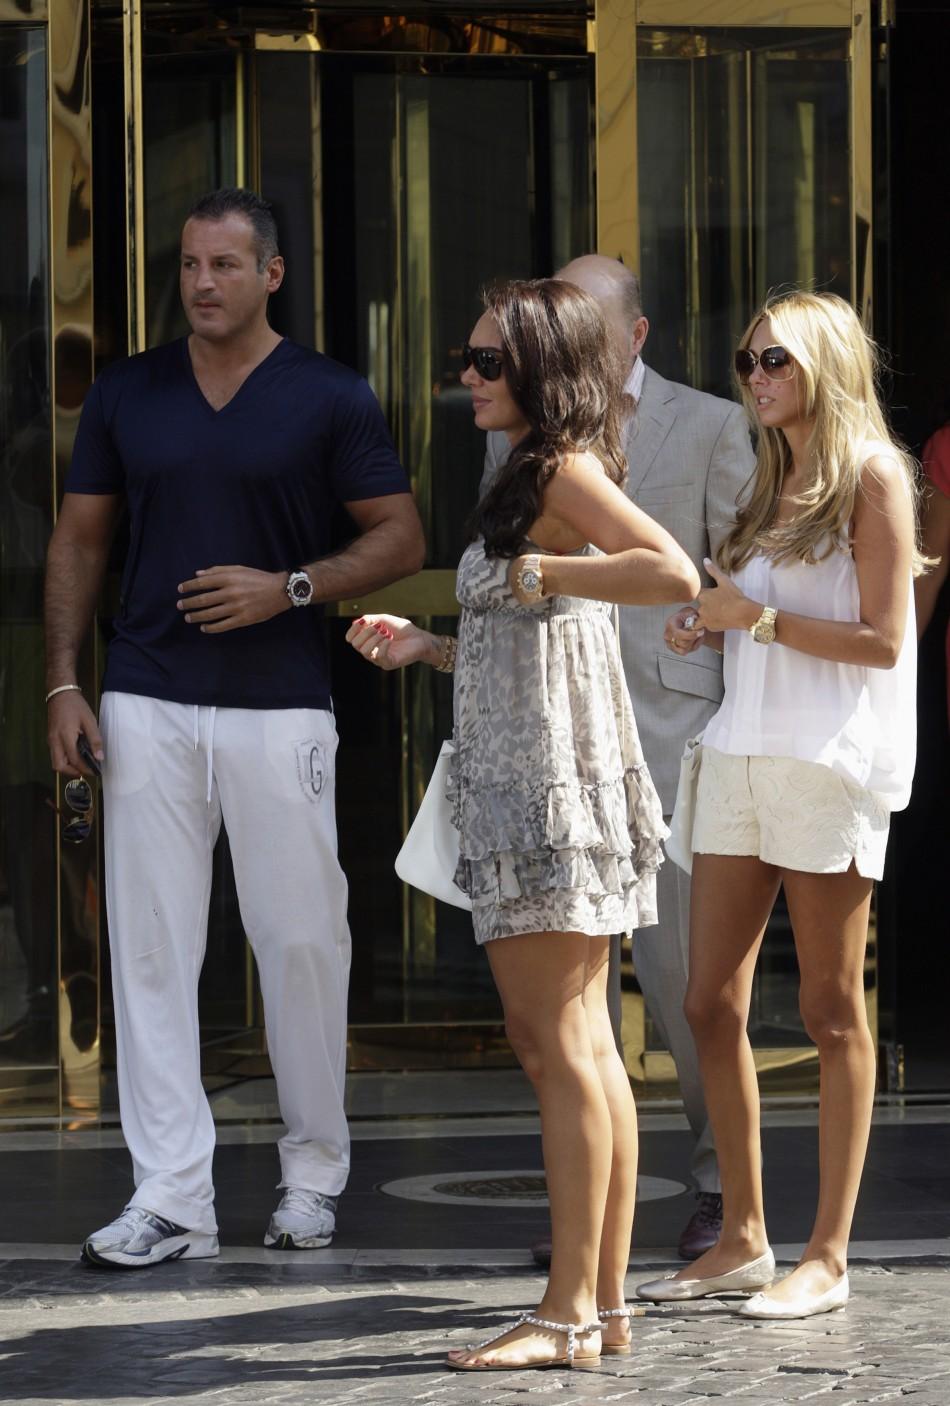 Tamara and Petra Ecclestone, daughters of Formula One supremo Bernie Ecclestone, leave a hotel in downtown Rome